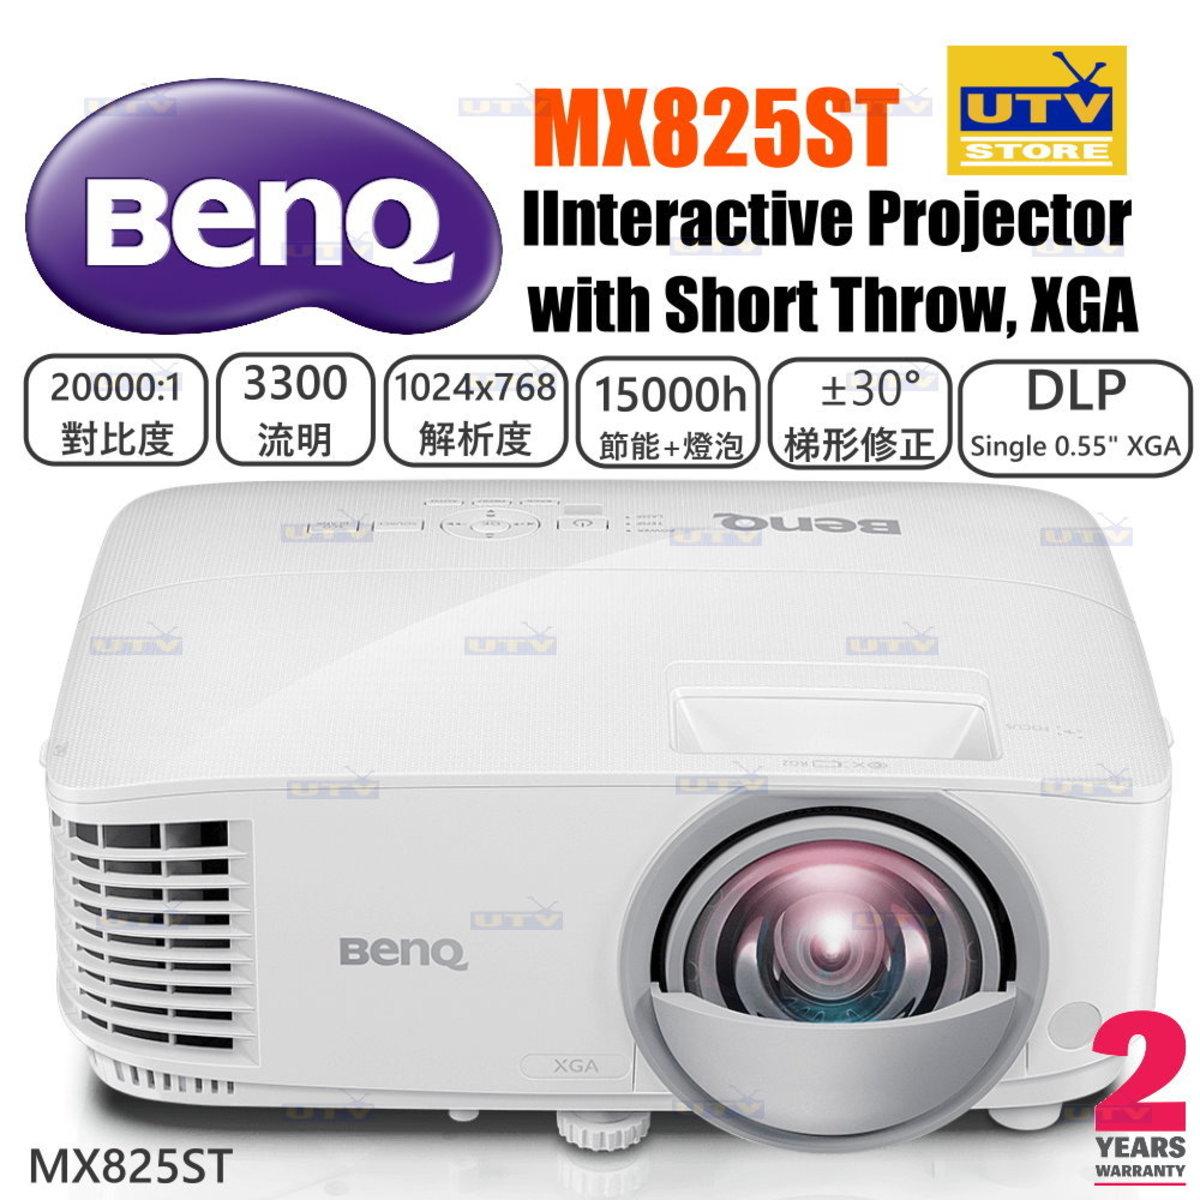 MX825ST Interactive Projector with Short Throw, XGA